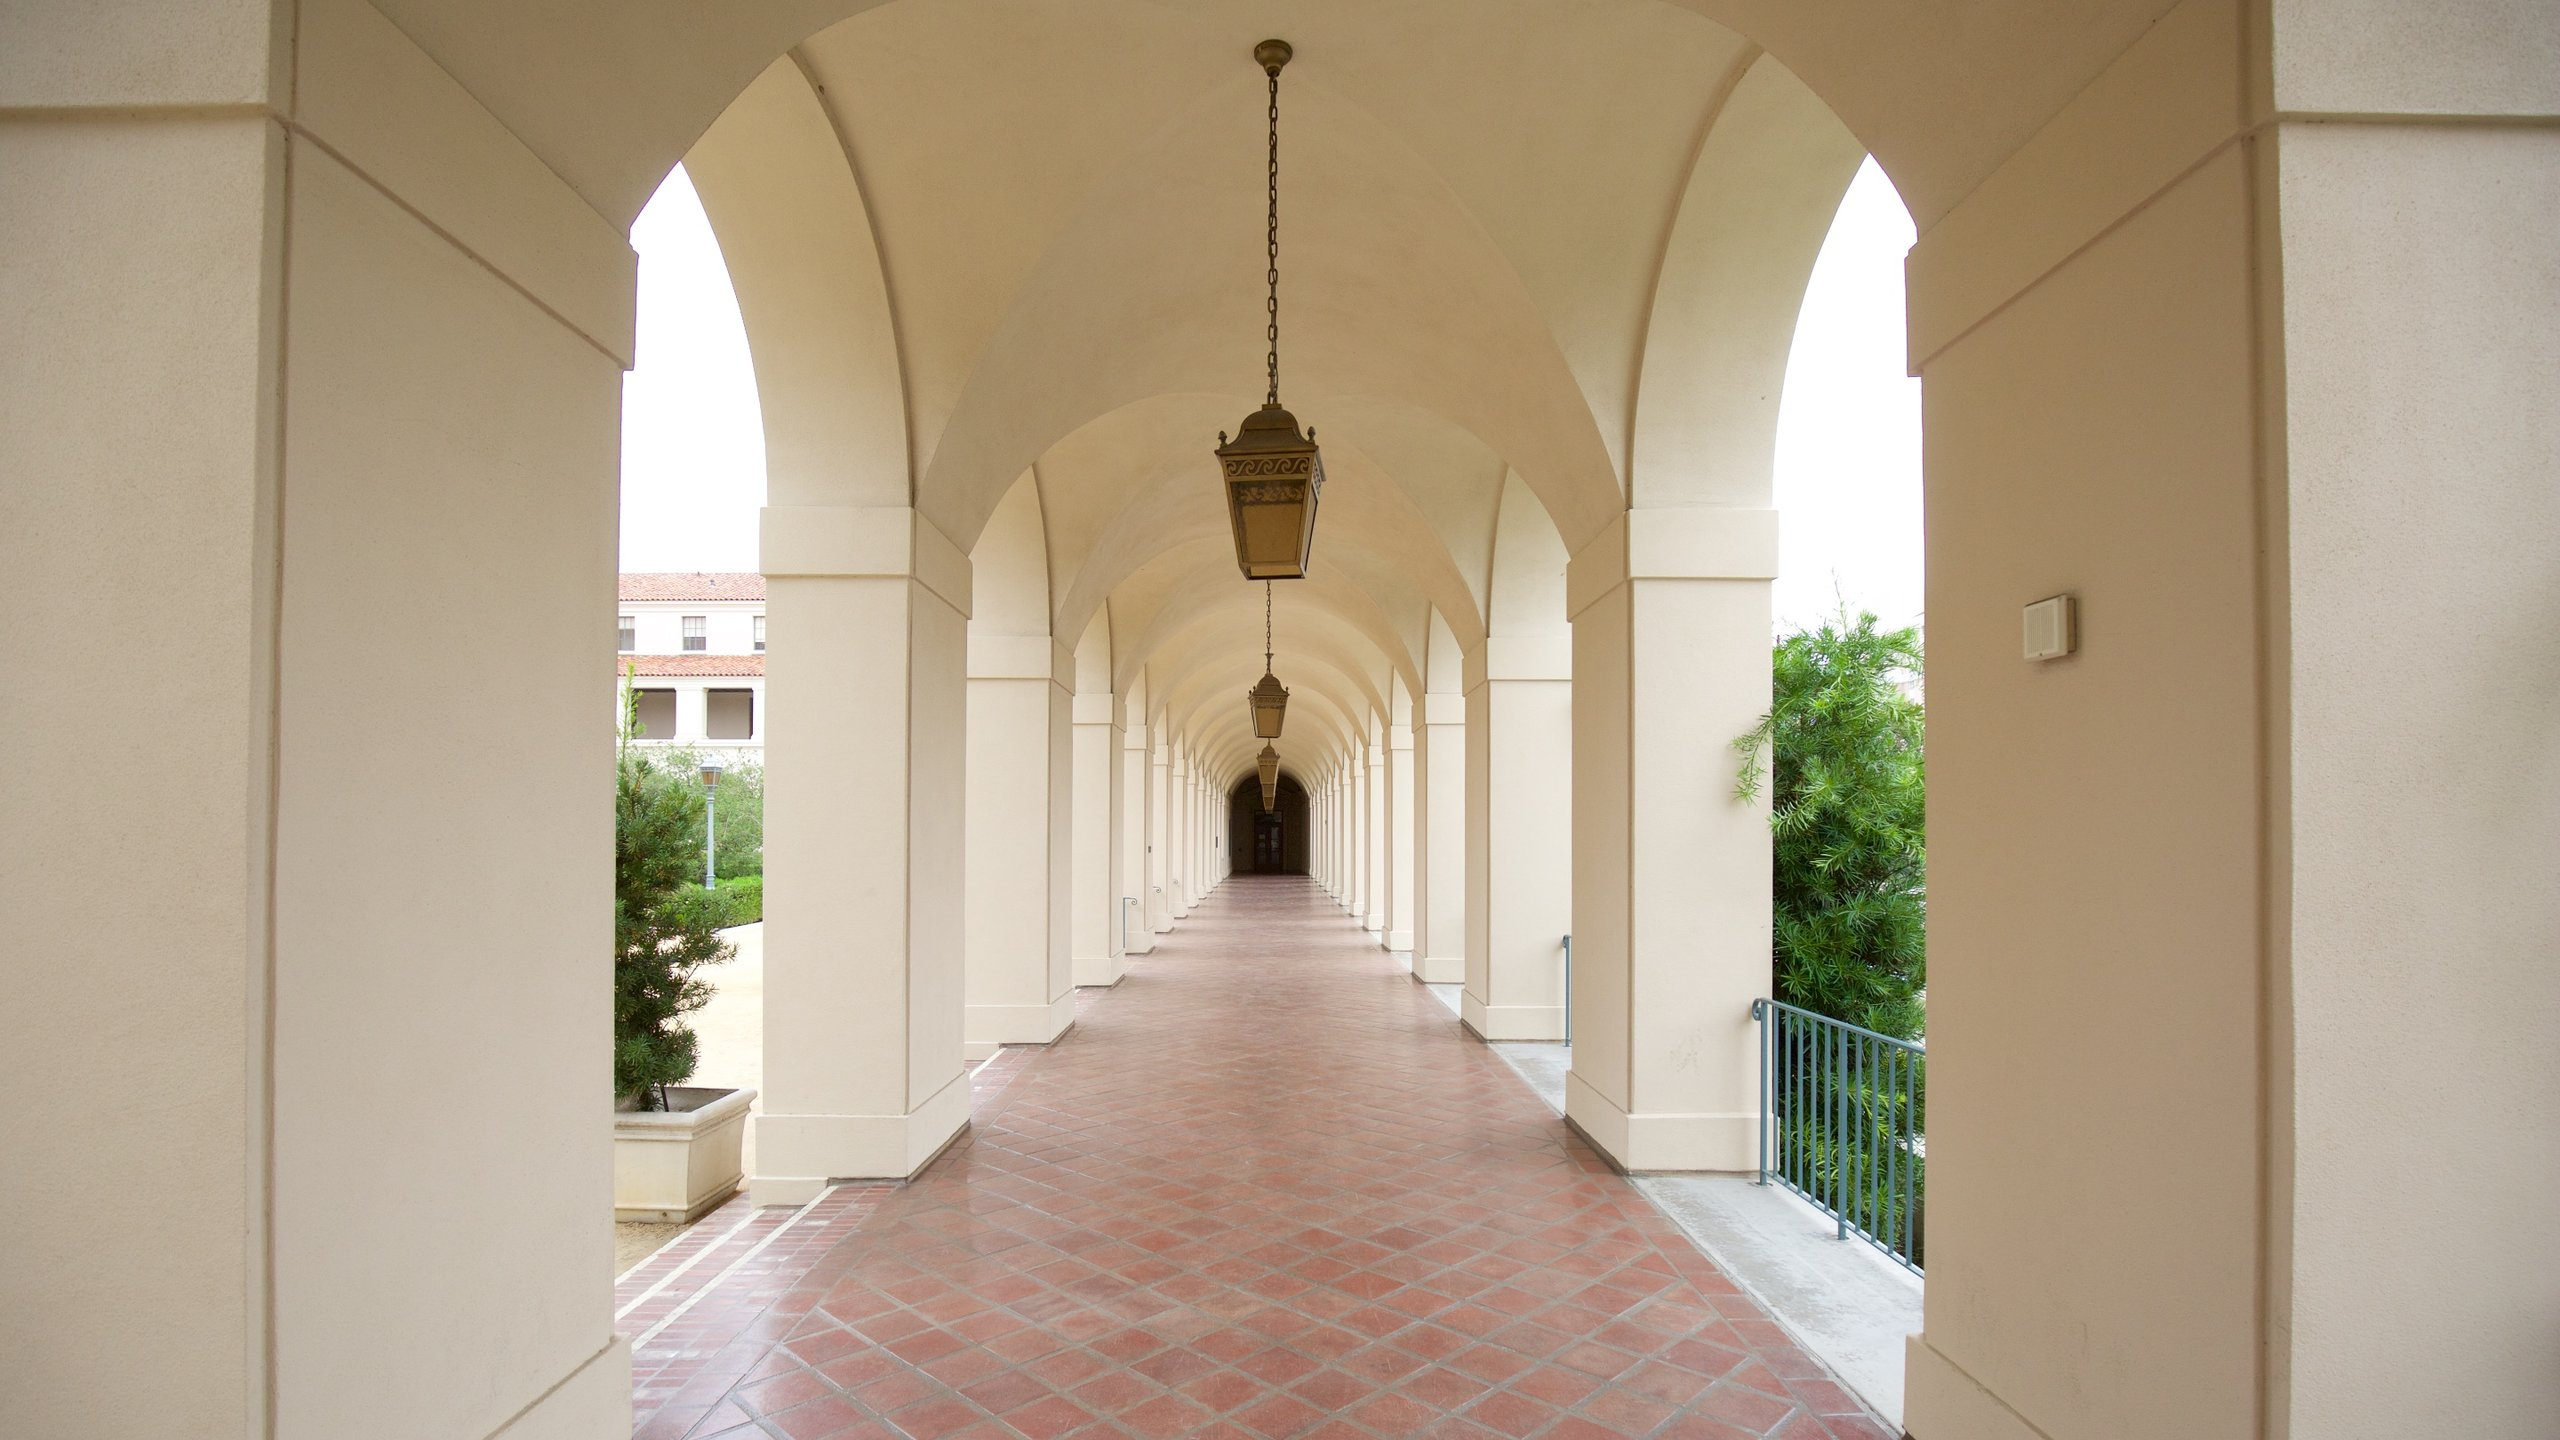 Pasadena, California, United States of America